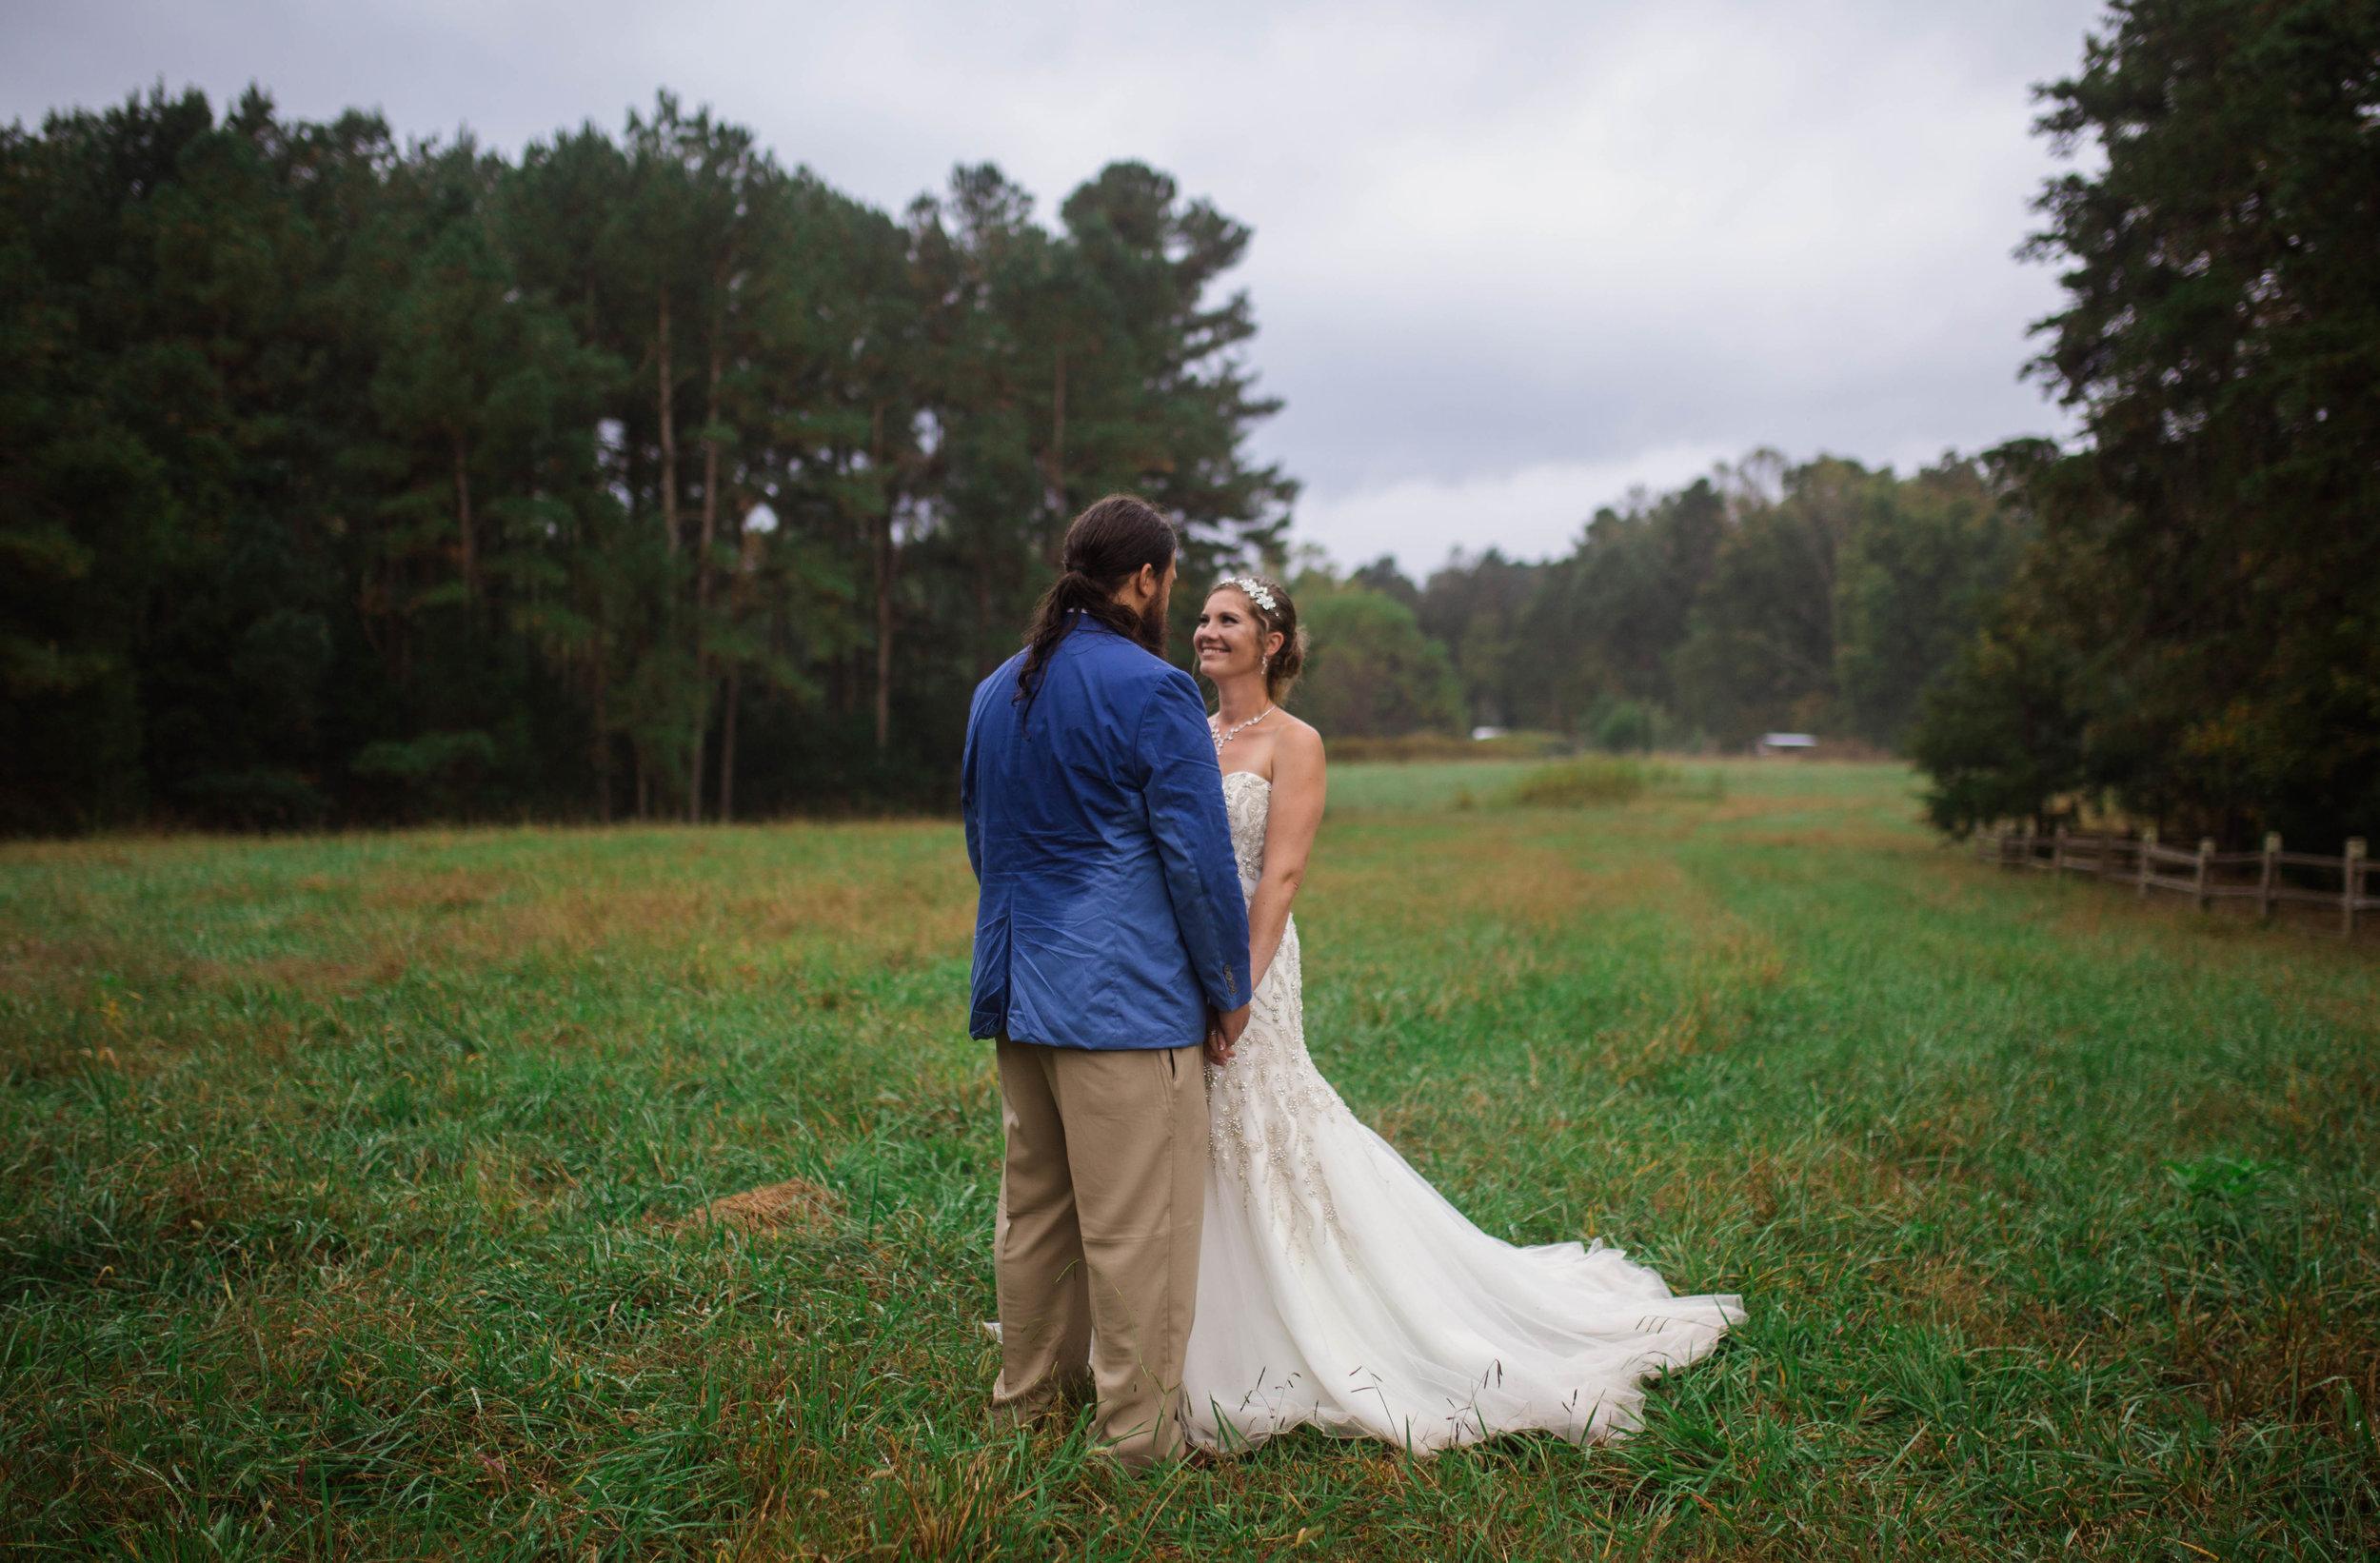 Rainy Wedding at Timberlake Earth Sanctuary in North Carolina